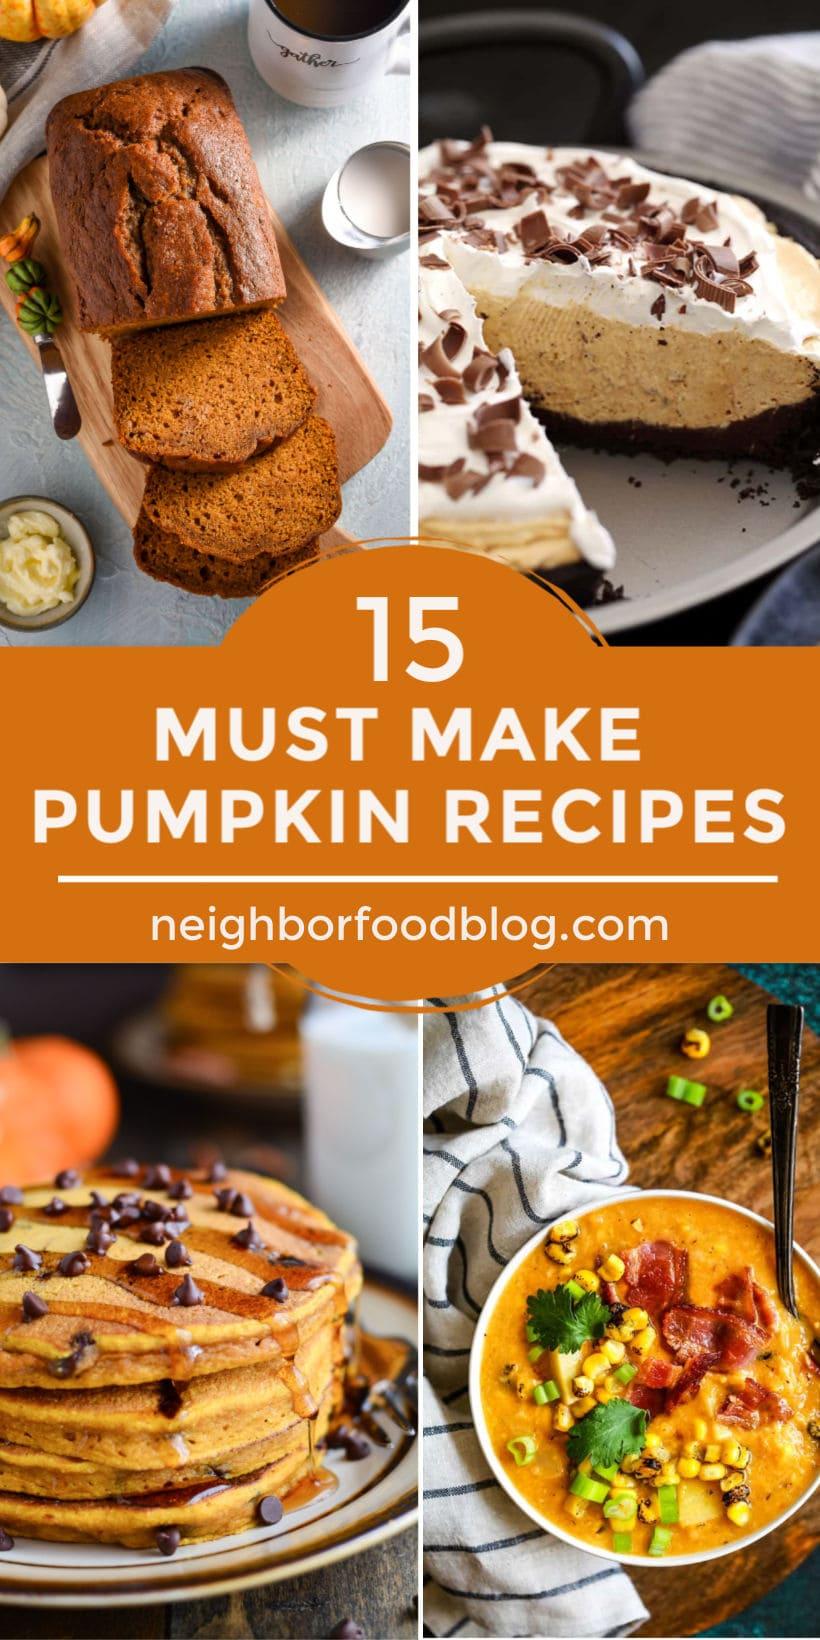 collage of canned pumpkin recipes including a stack of pumpkin pancakes, pumpkin chowder, pumpkin bread, and pumpkin cheesecake